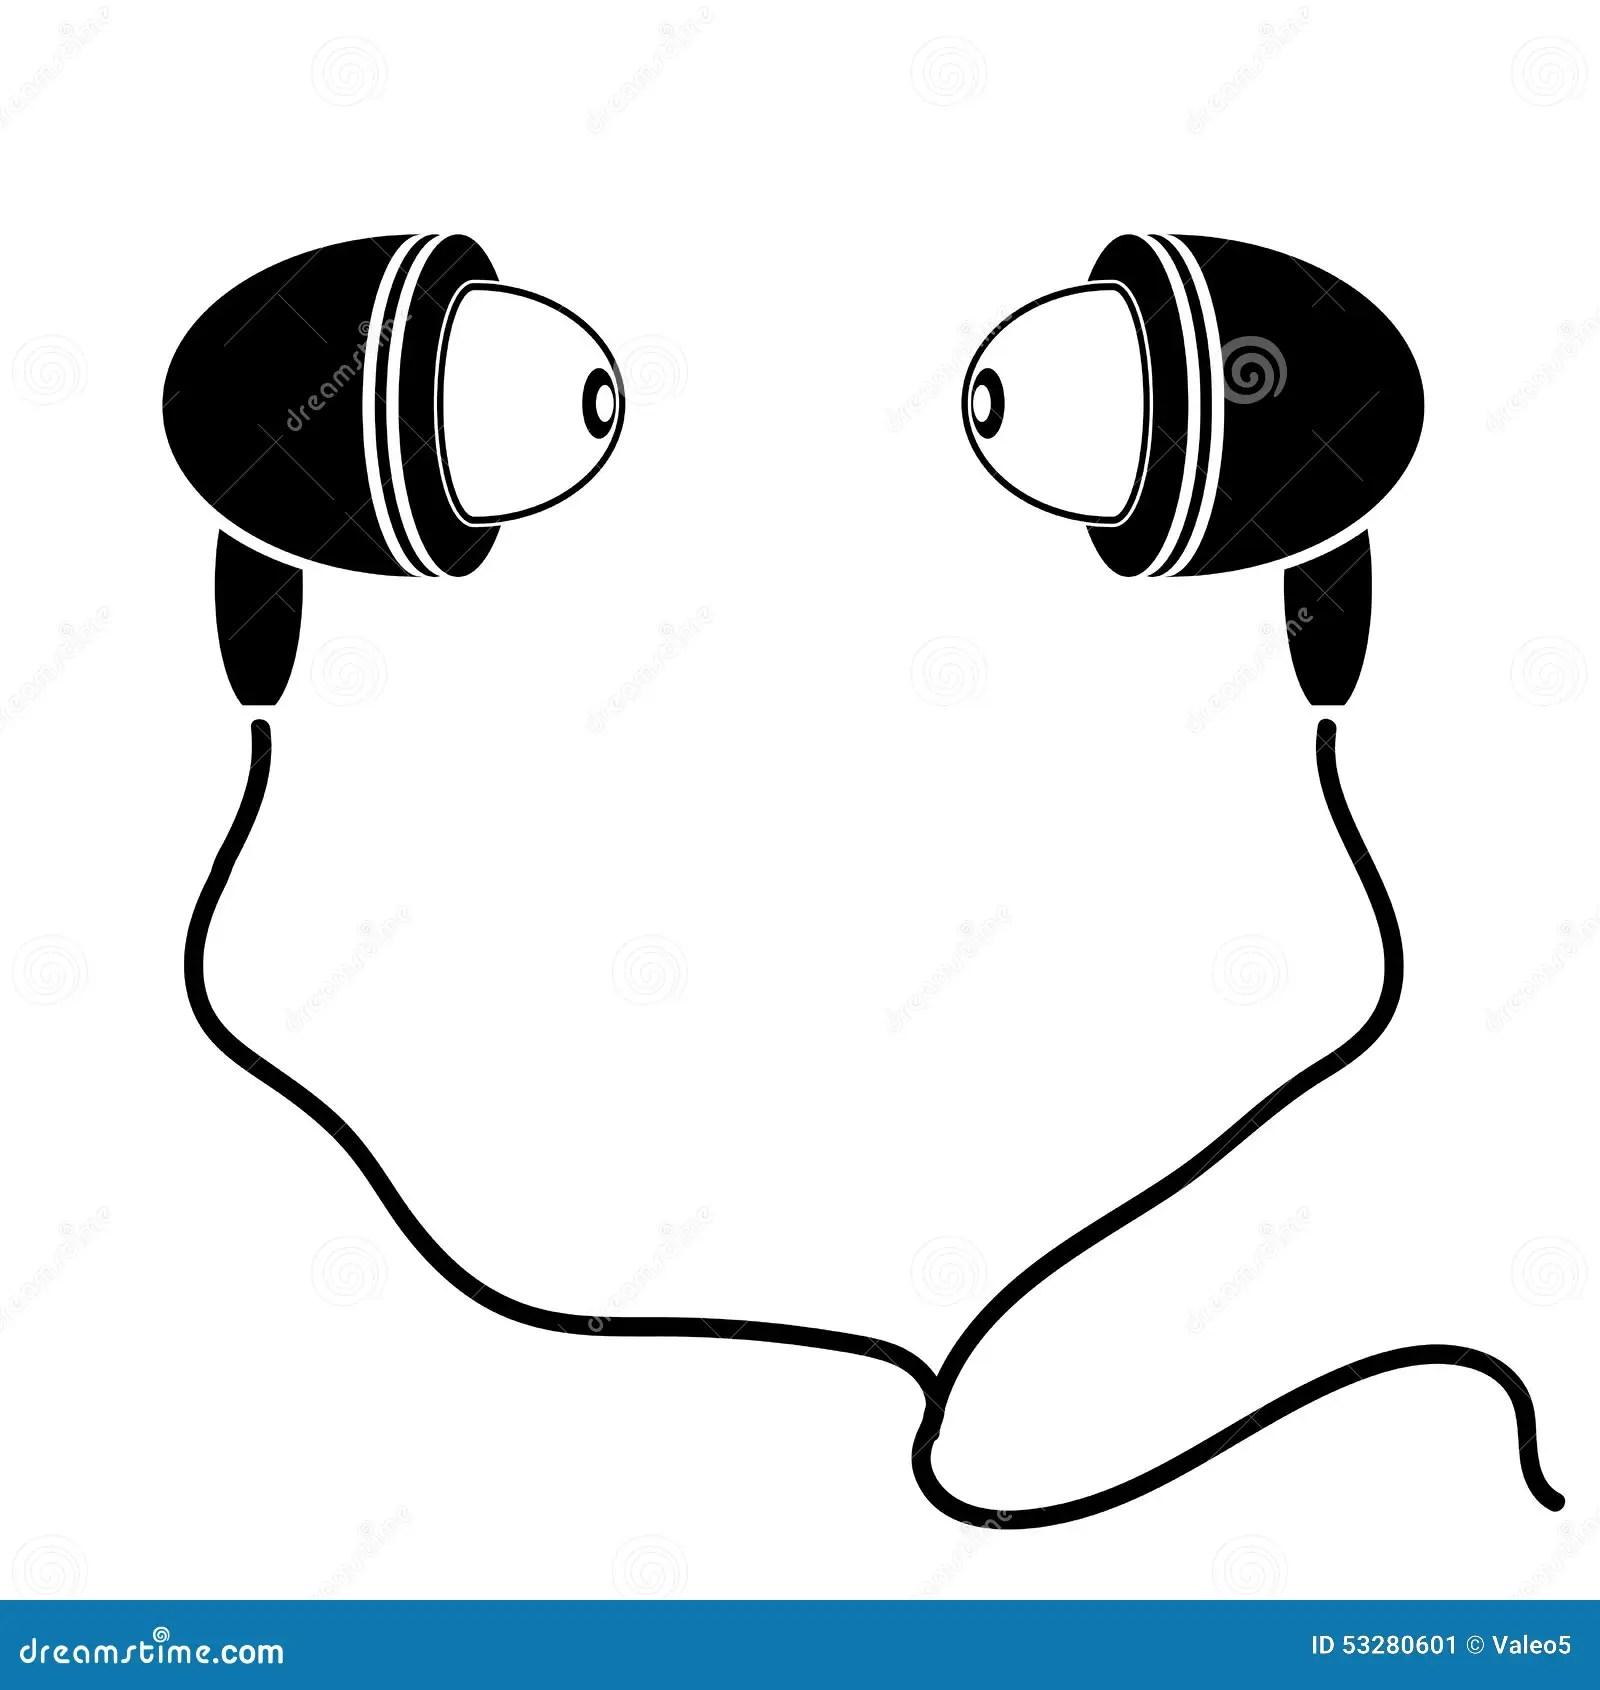 Earphones Silhouette Stock Vector Illustration Of